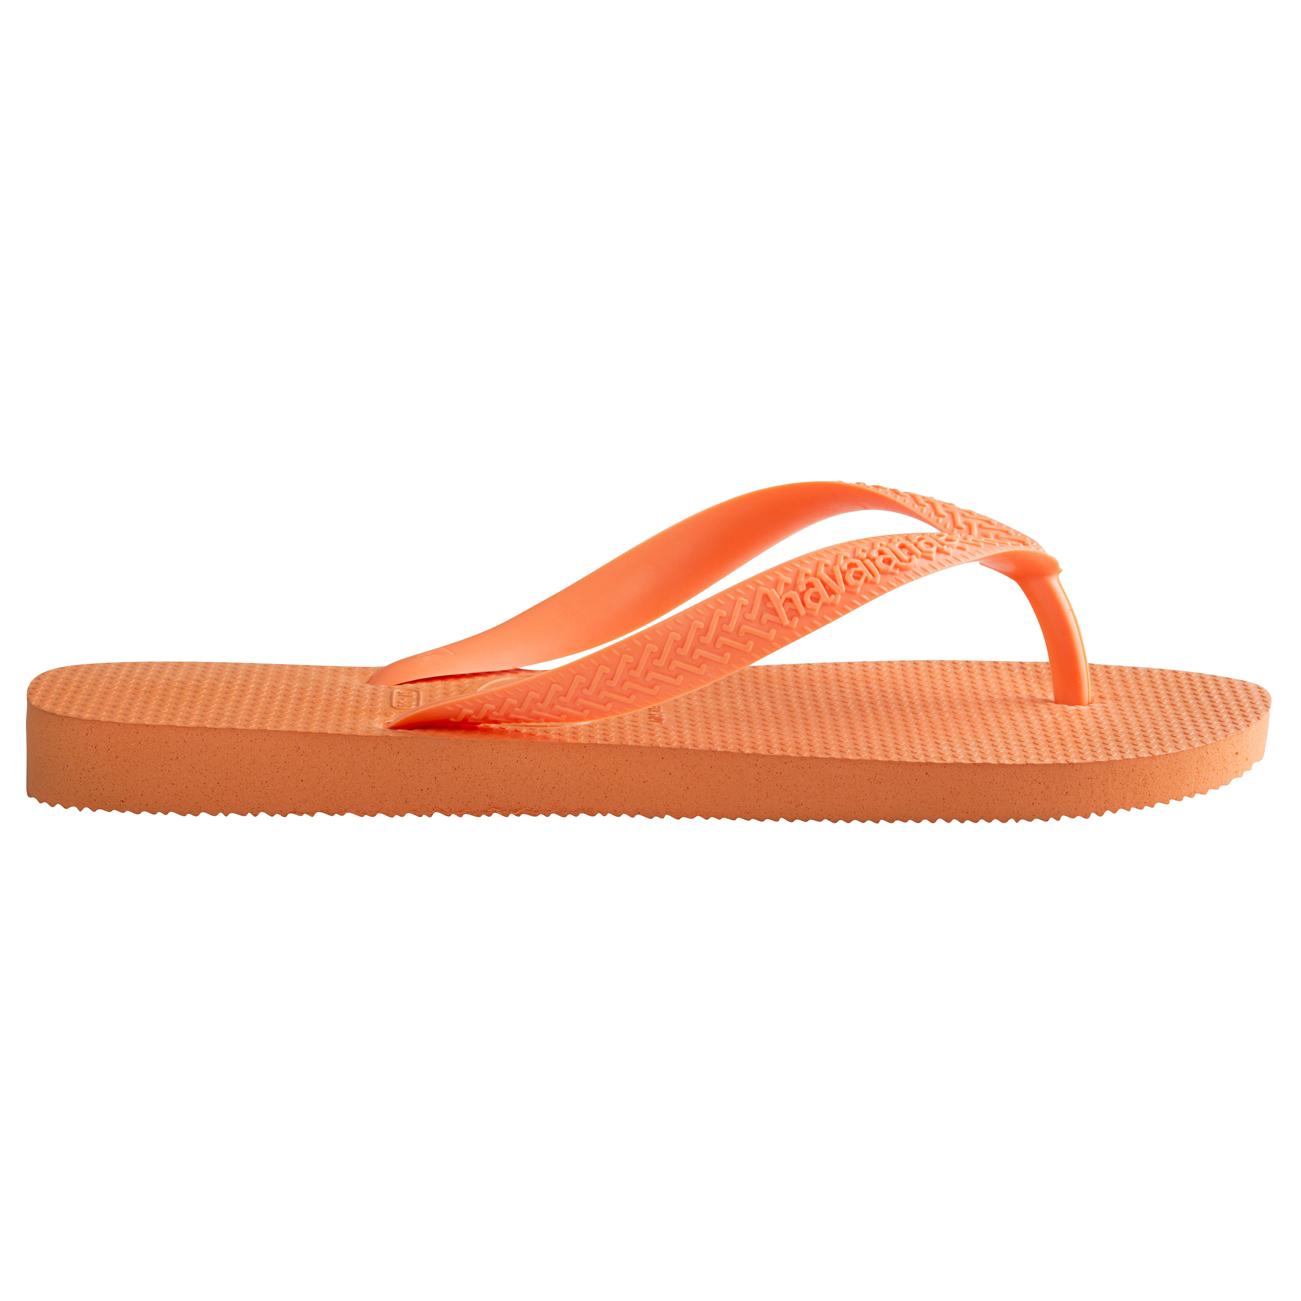 Havaianas Top Sandal (Women's) JdKfn0v9